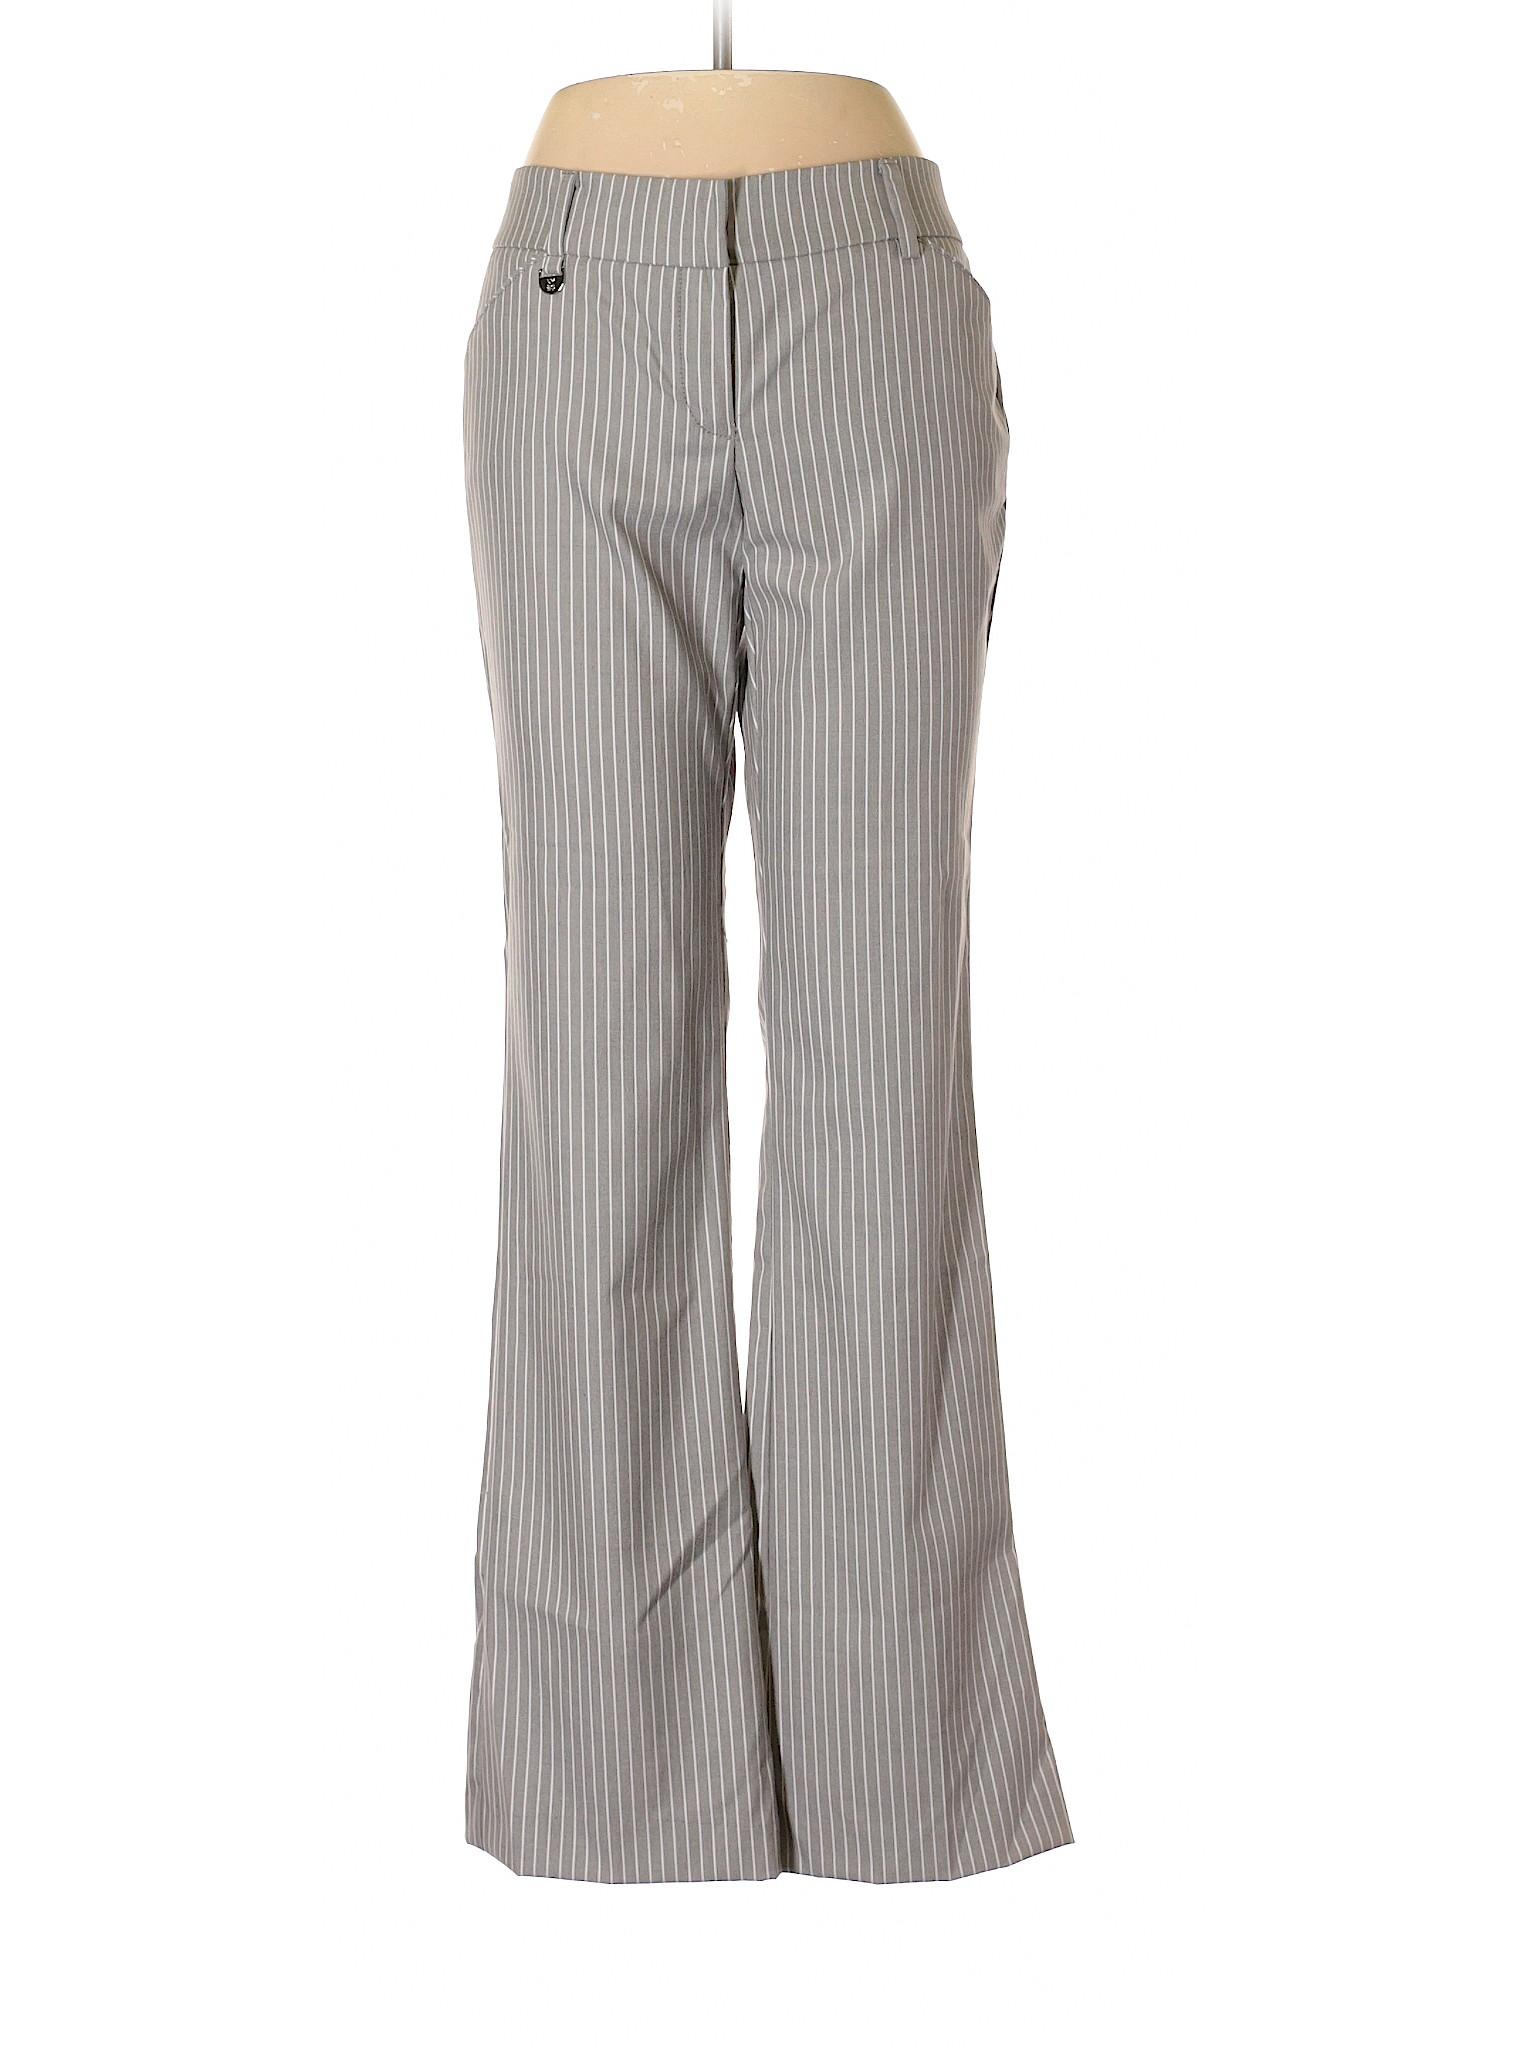 Boutique Pants New amp; Company Dress York afaRqn8r